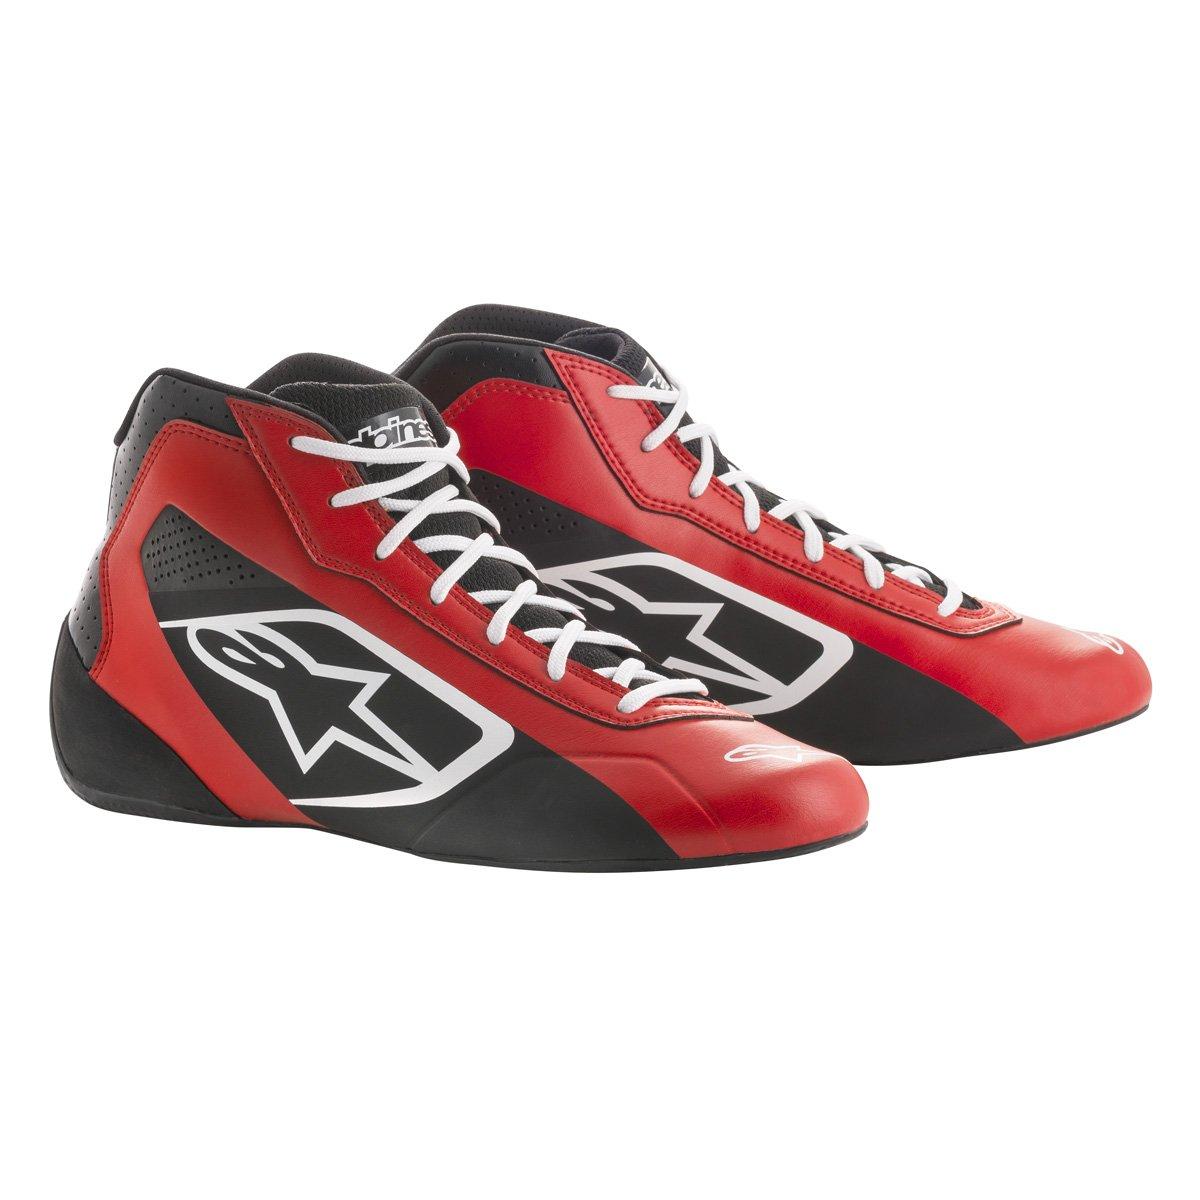 Alpinestars 2711518-12B-13 Tech 1-K Start Shoes, Black/White, Size 13